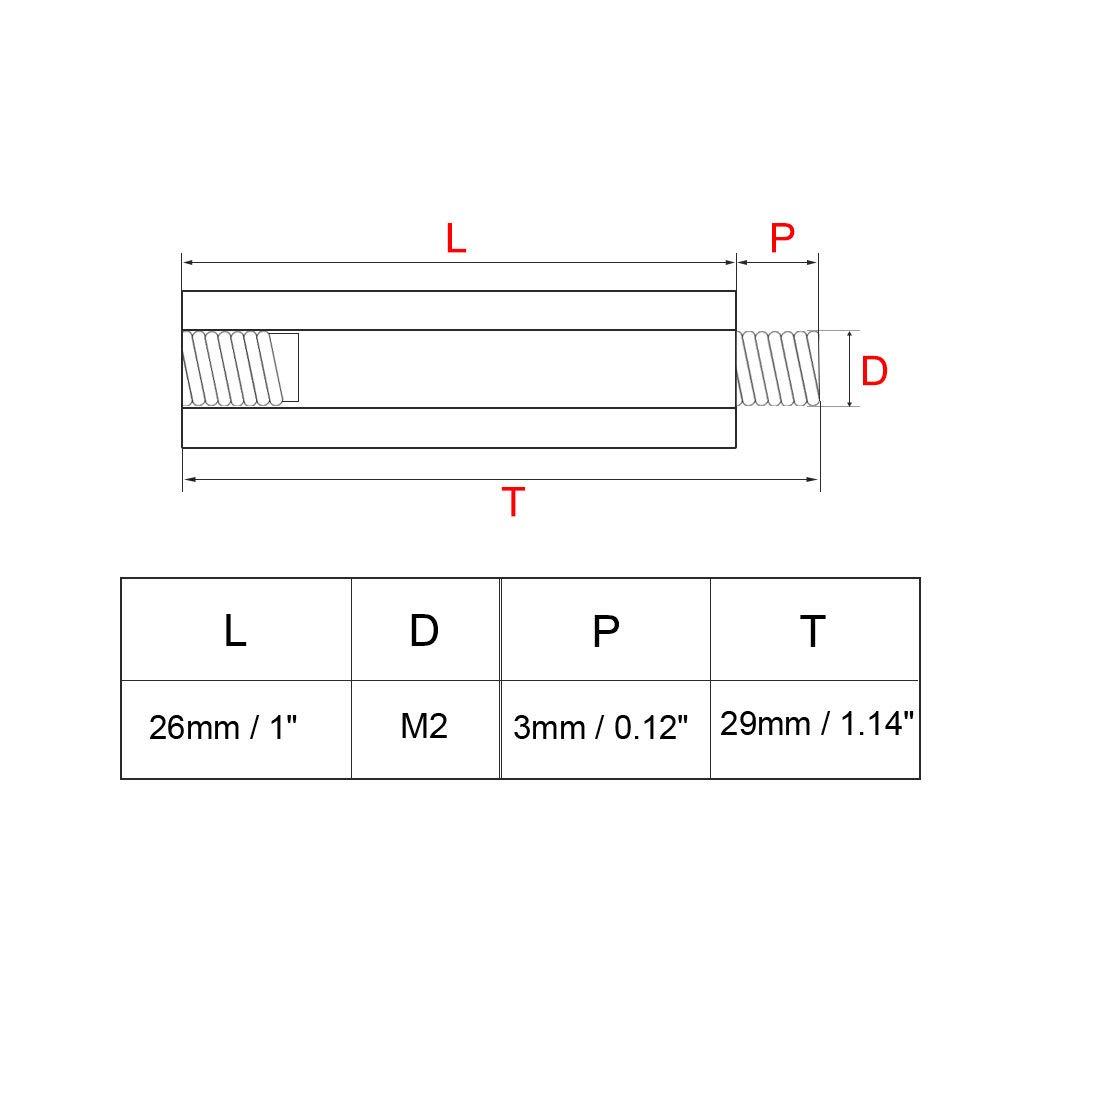 sourcing map Espaciador separador tornillo en forma redonda Pilar PCB con rosca macho de material de lat/ón de M2 18+3mm 50 piezas